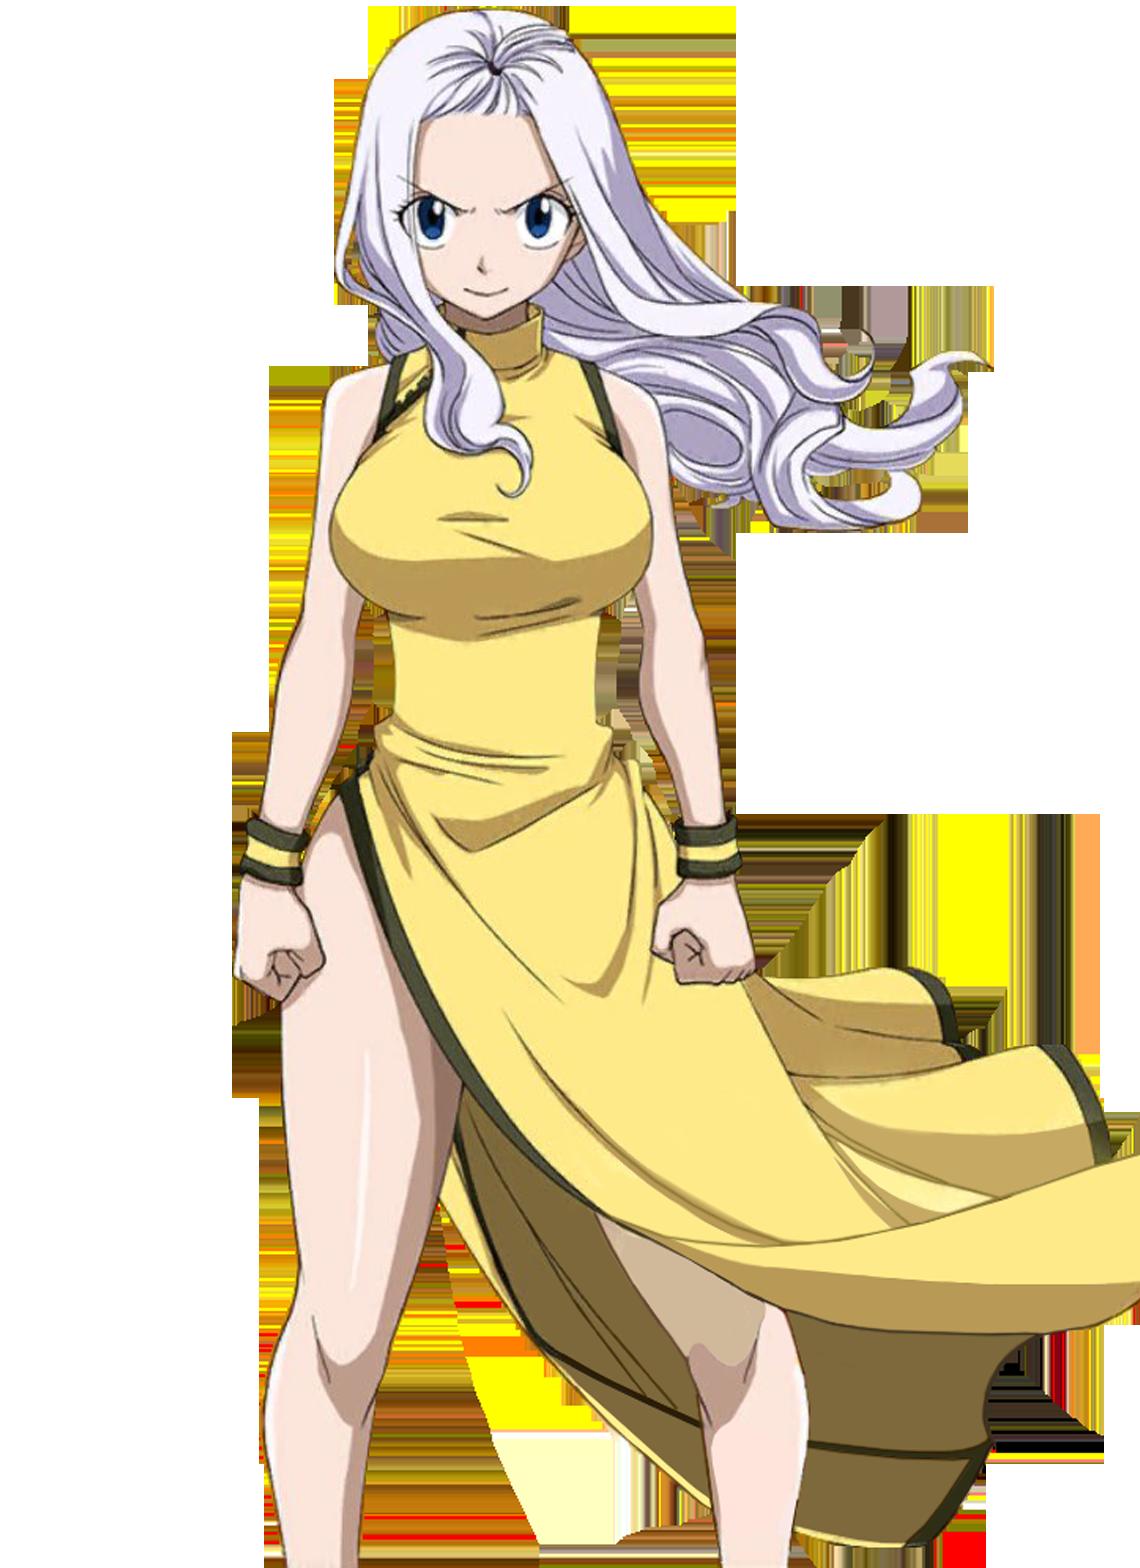 Mirajane Strauss Tartaros Arc Fairy Tail Girls Mirajane Fairy Tail Fairy Tail Guild This is the official twitter page of mirajane strauss. mirajane strauss tartaros arc fairy